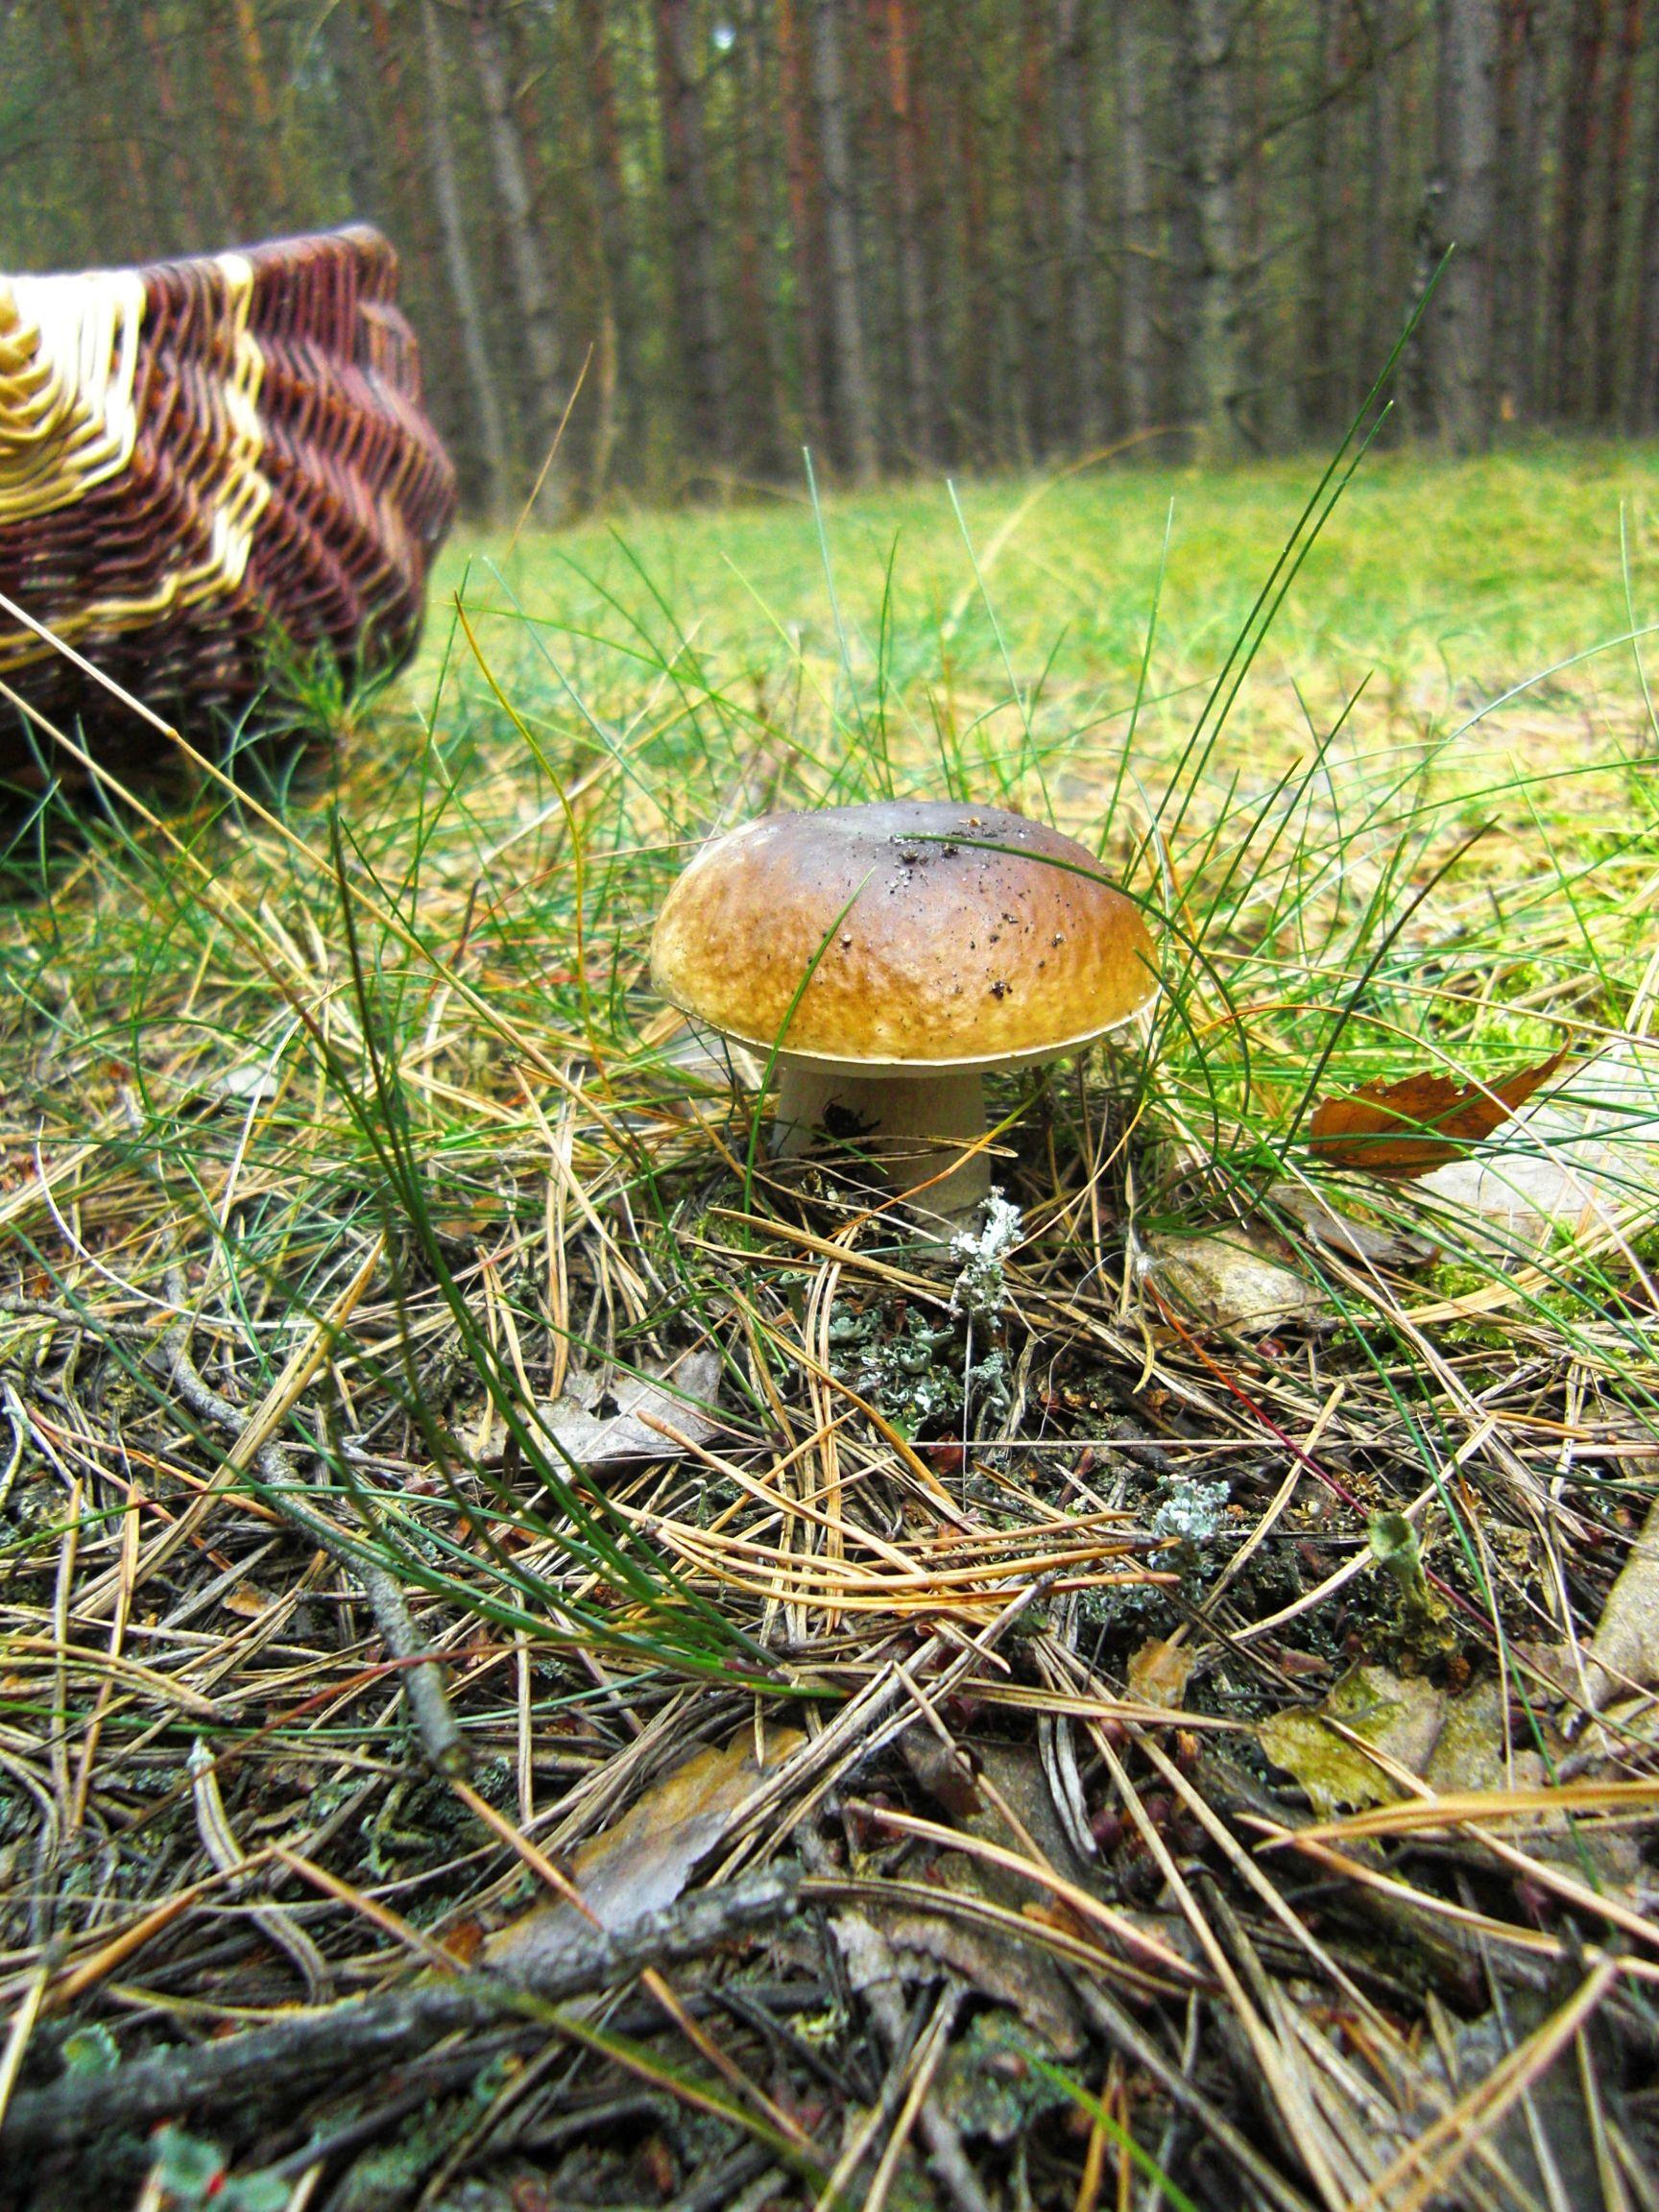 Pilze Sammeln Macht Glucklich Stuffed Mushrooms Woodlands Cottage Porcini Mushrooms